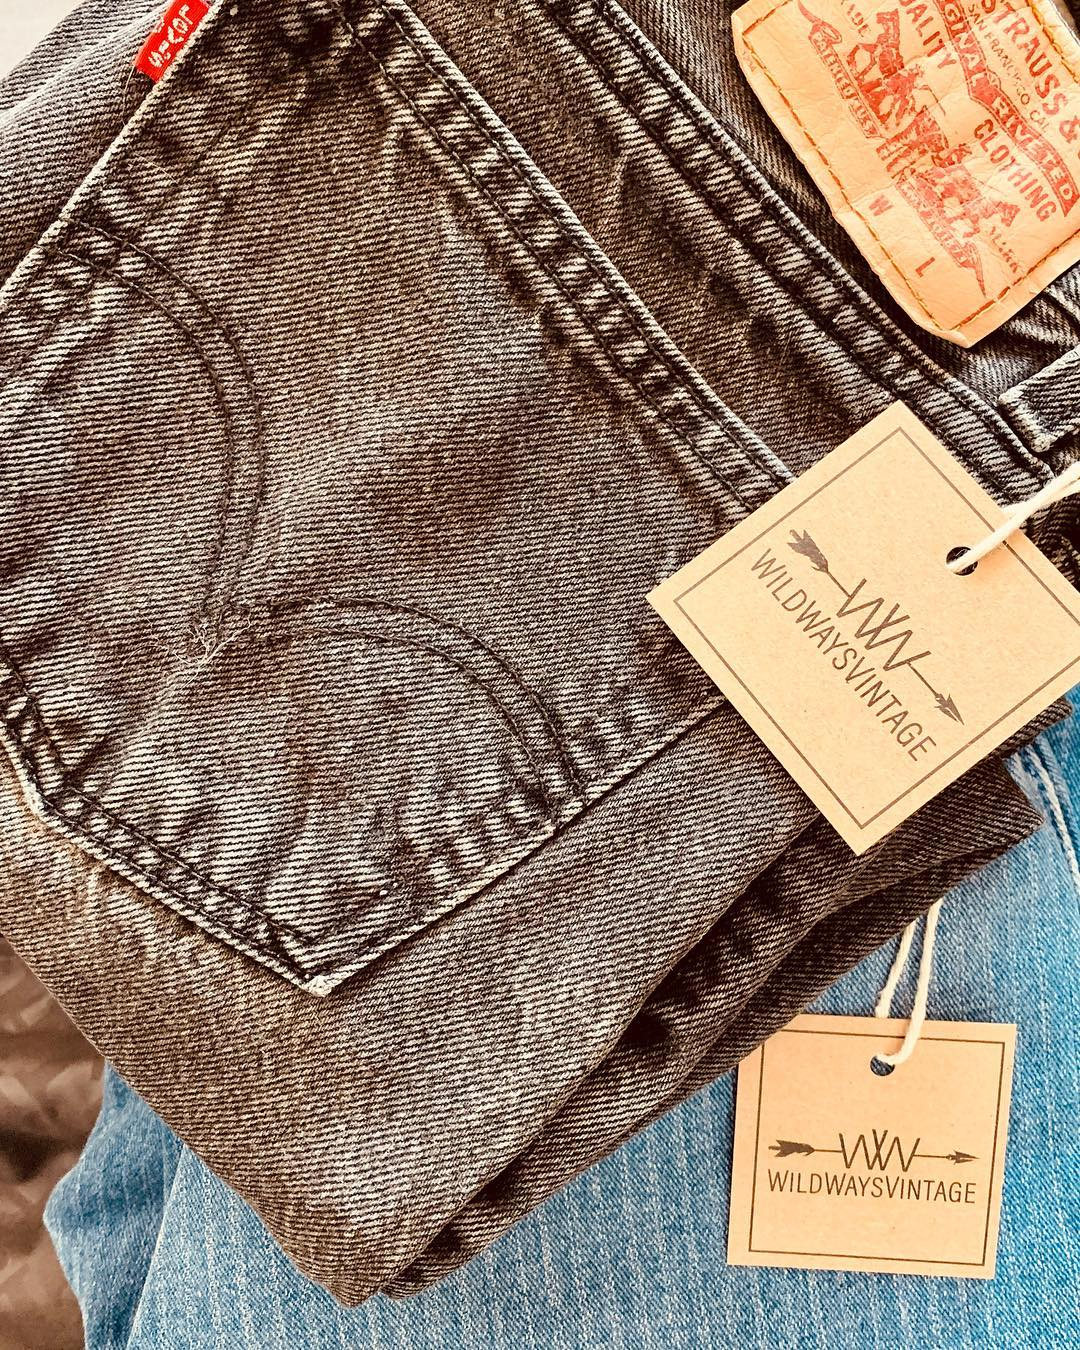 vintage-levis-jeans.jpg